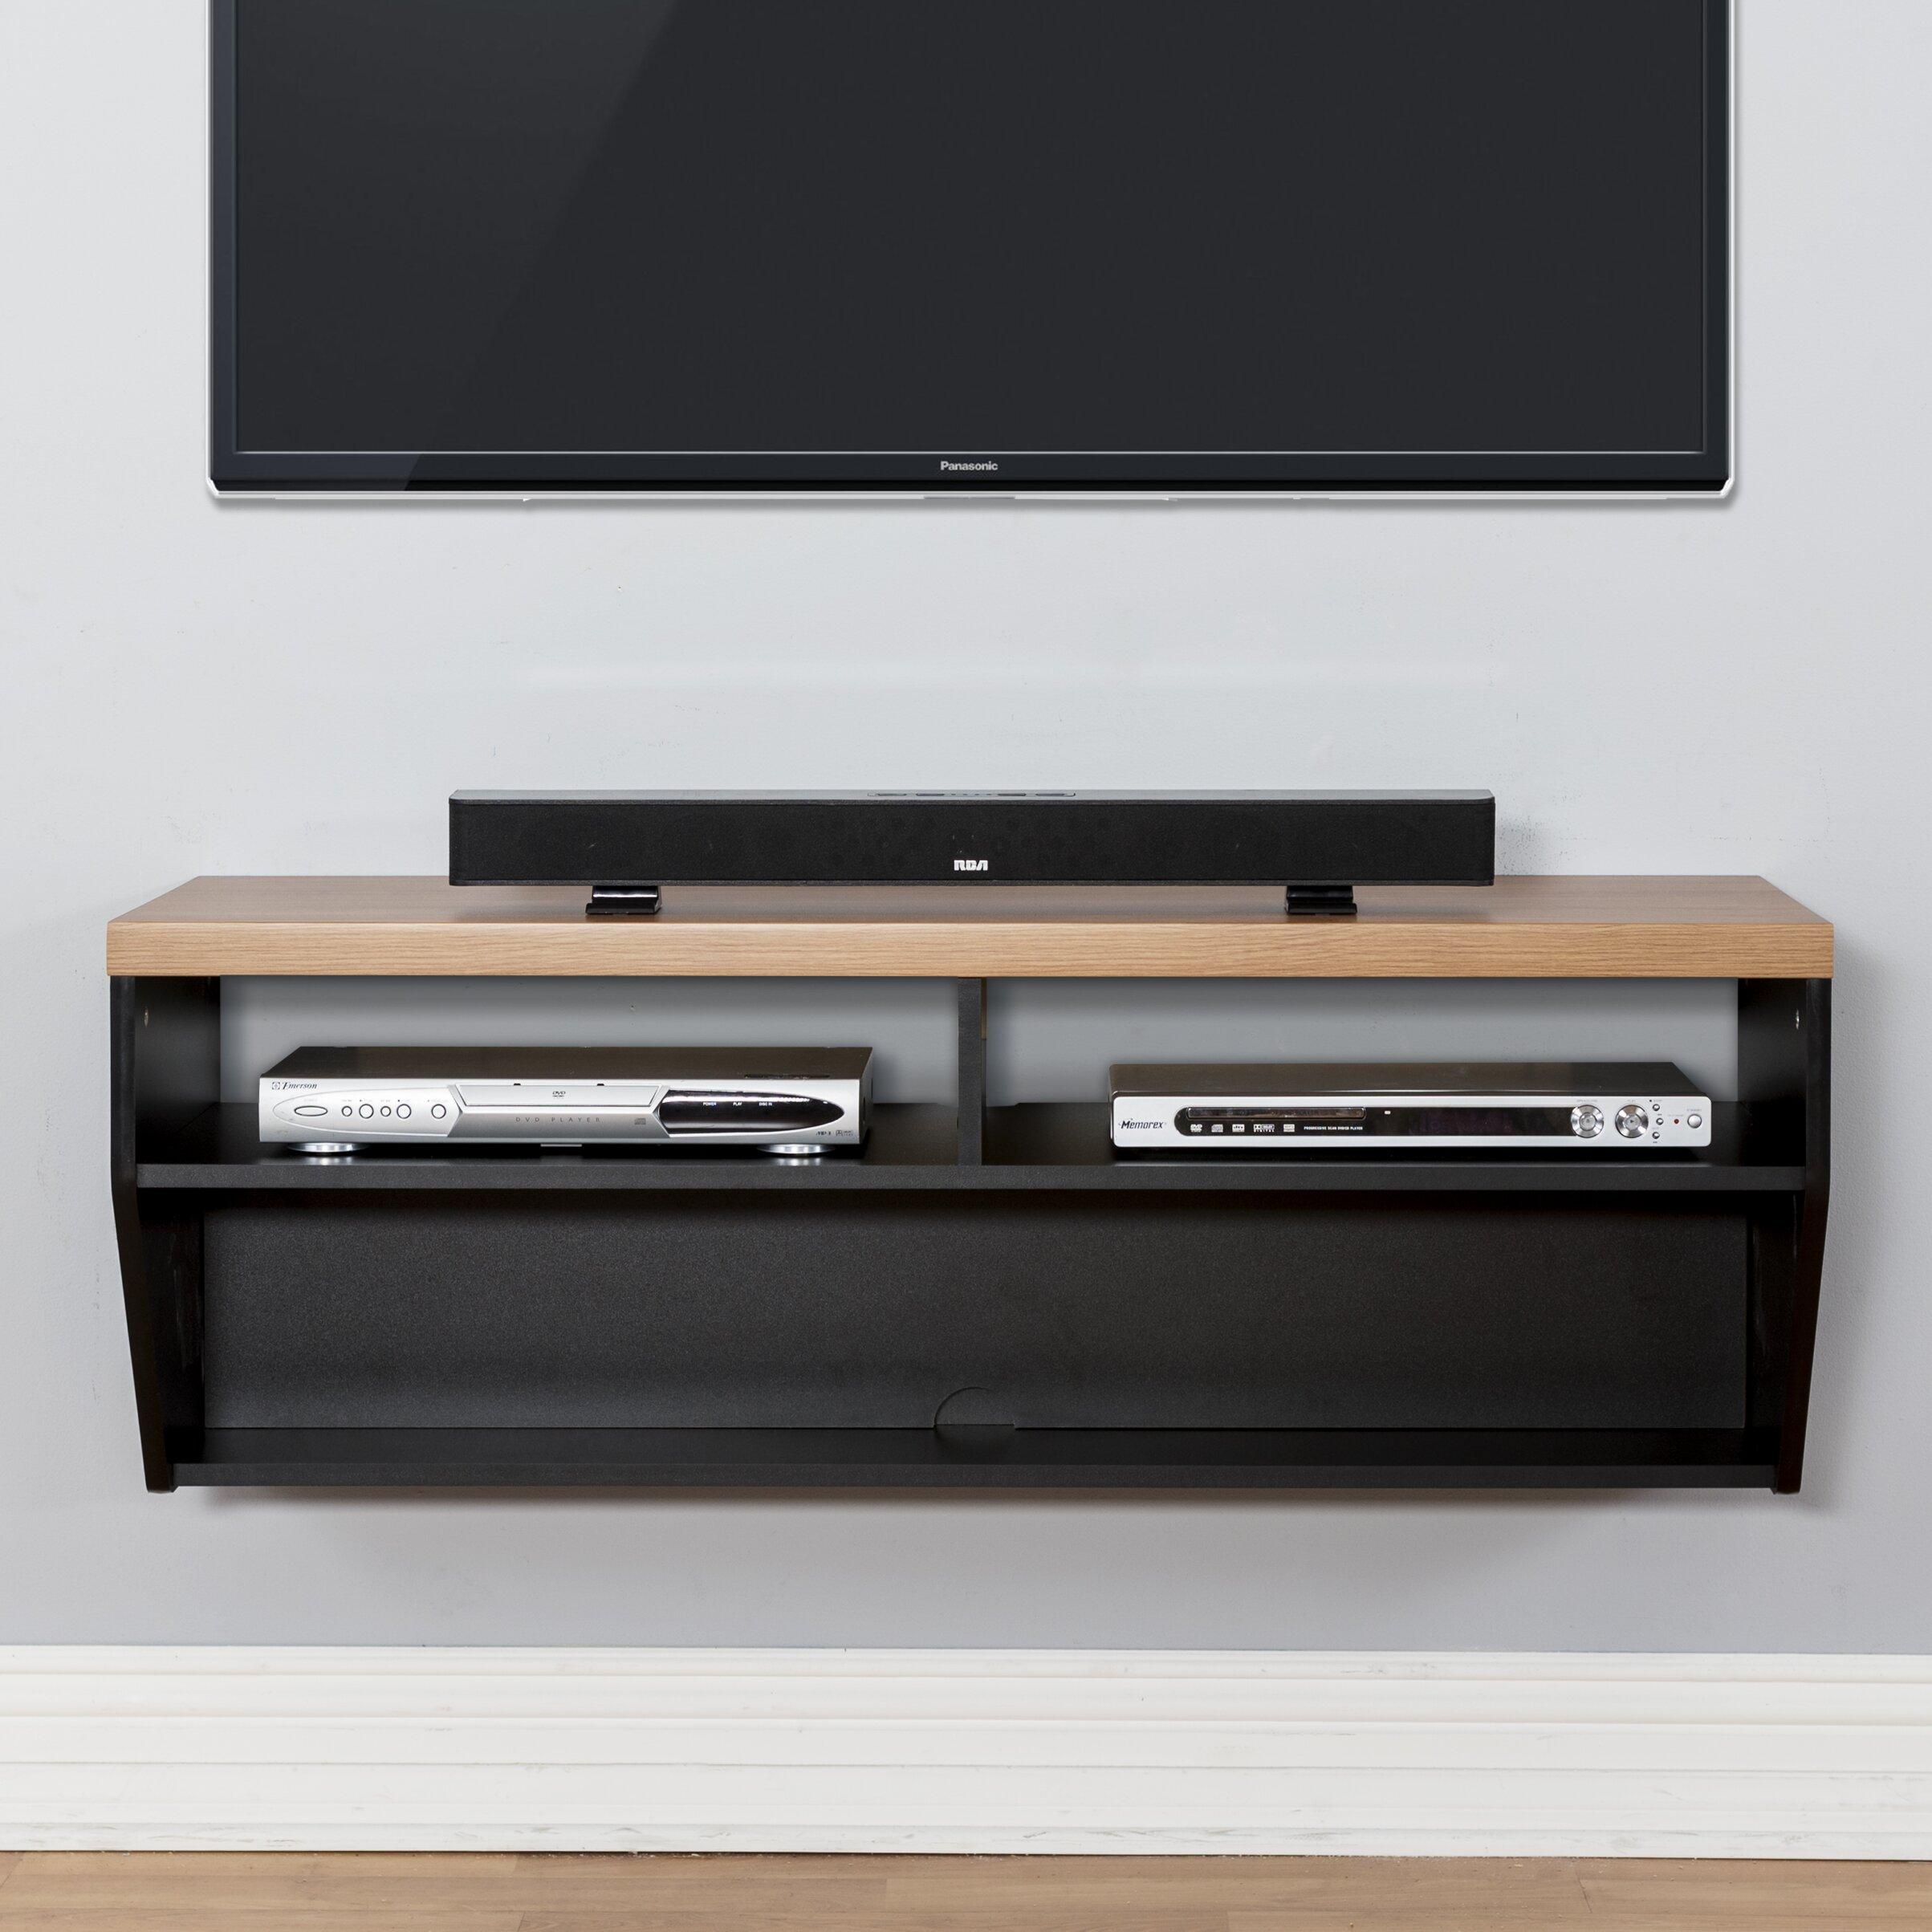 48 angled sides wall mounted tv component shelf wayfair - Slanted wall tv mount ...